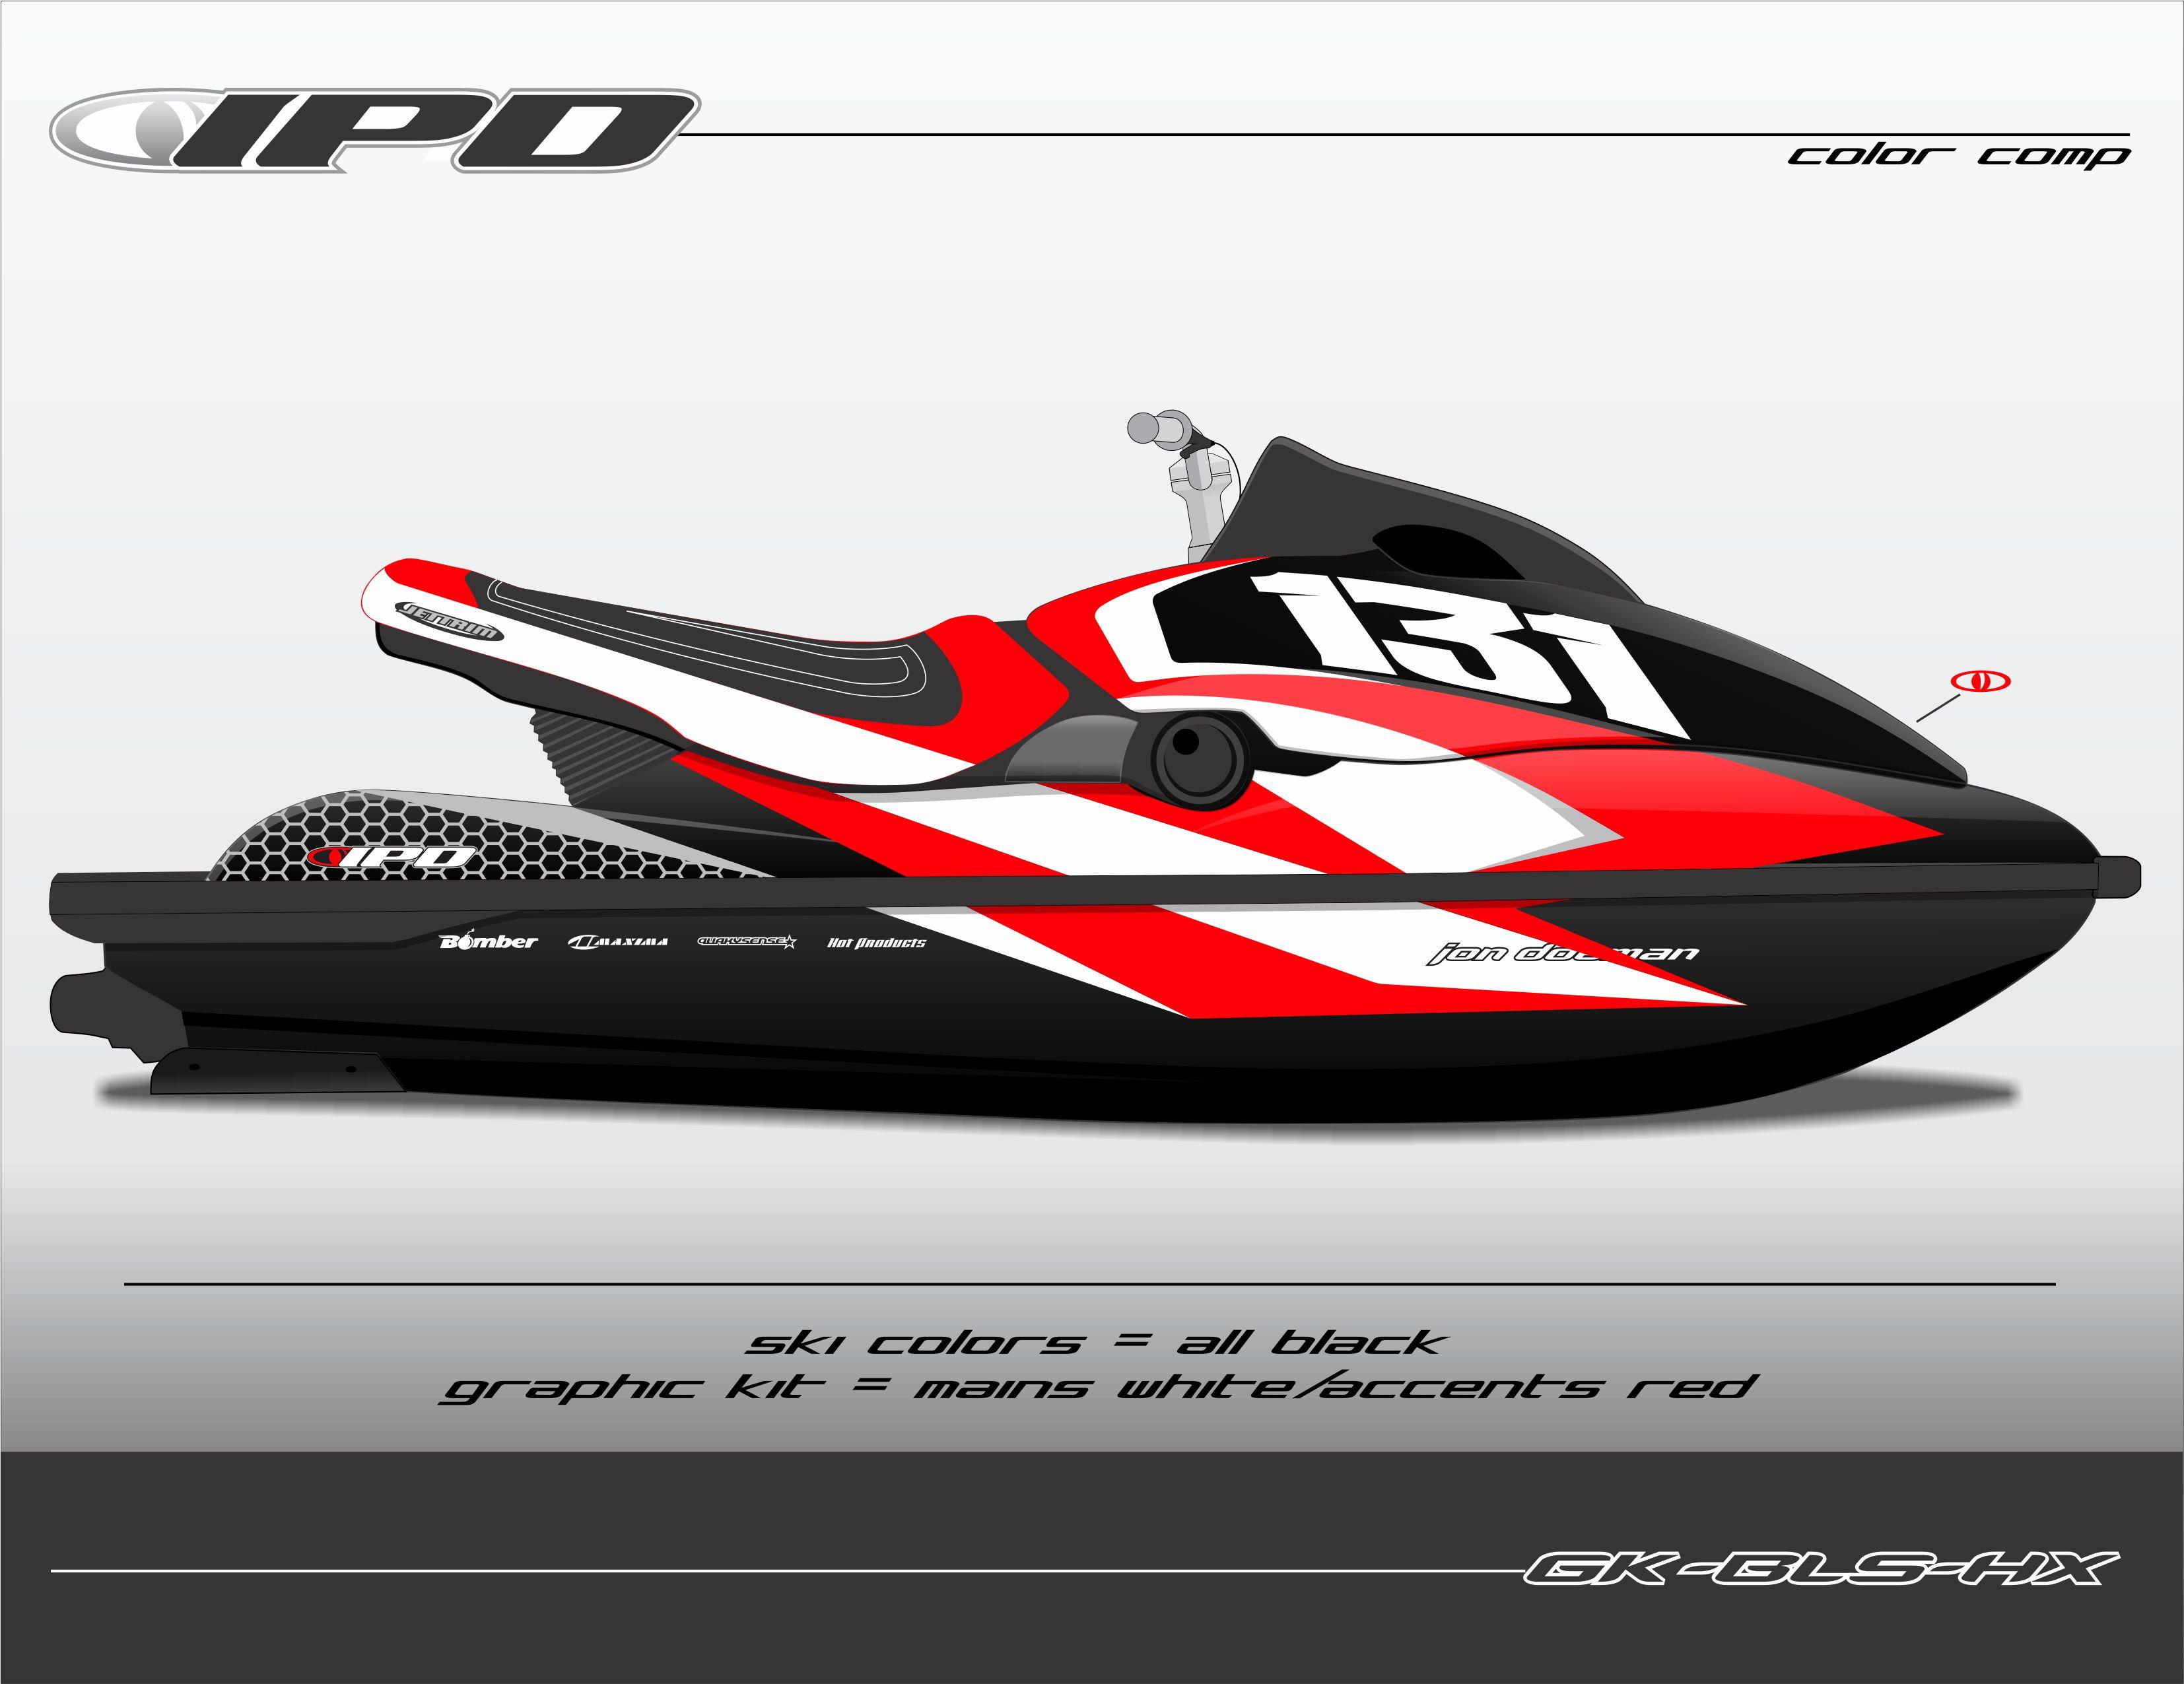 download 2000 seadoo gtx di millenium edition manual muscle rh jiblocenazohe tk 2000 seadoo gtx rfi service manual 2000 seadoo gtx user manual